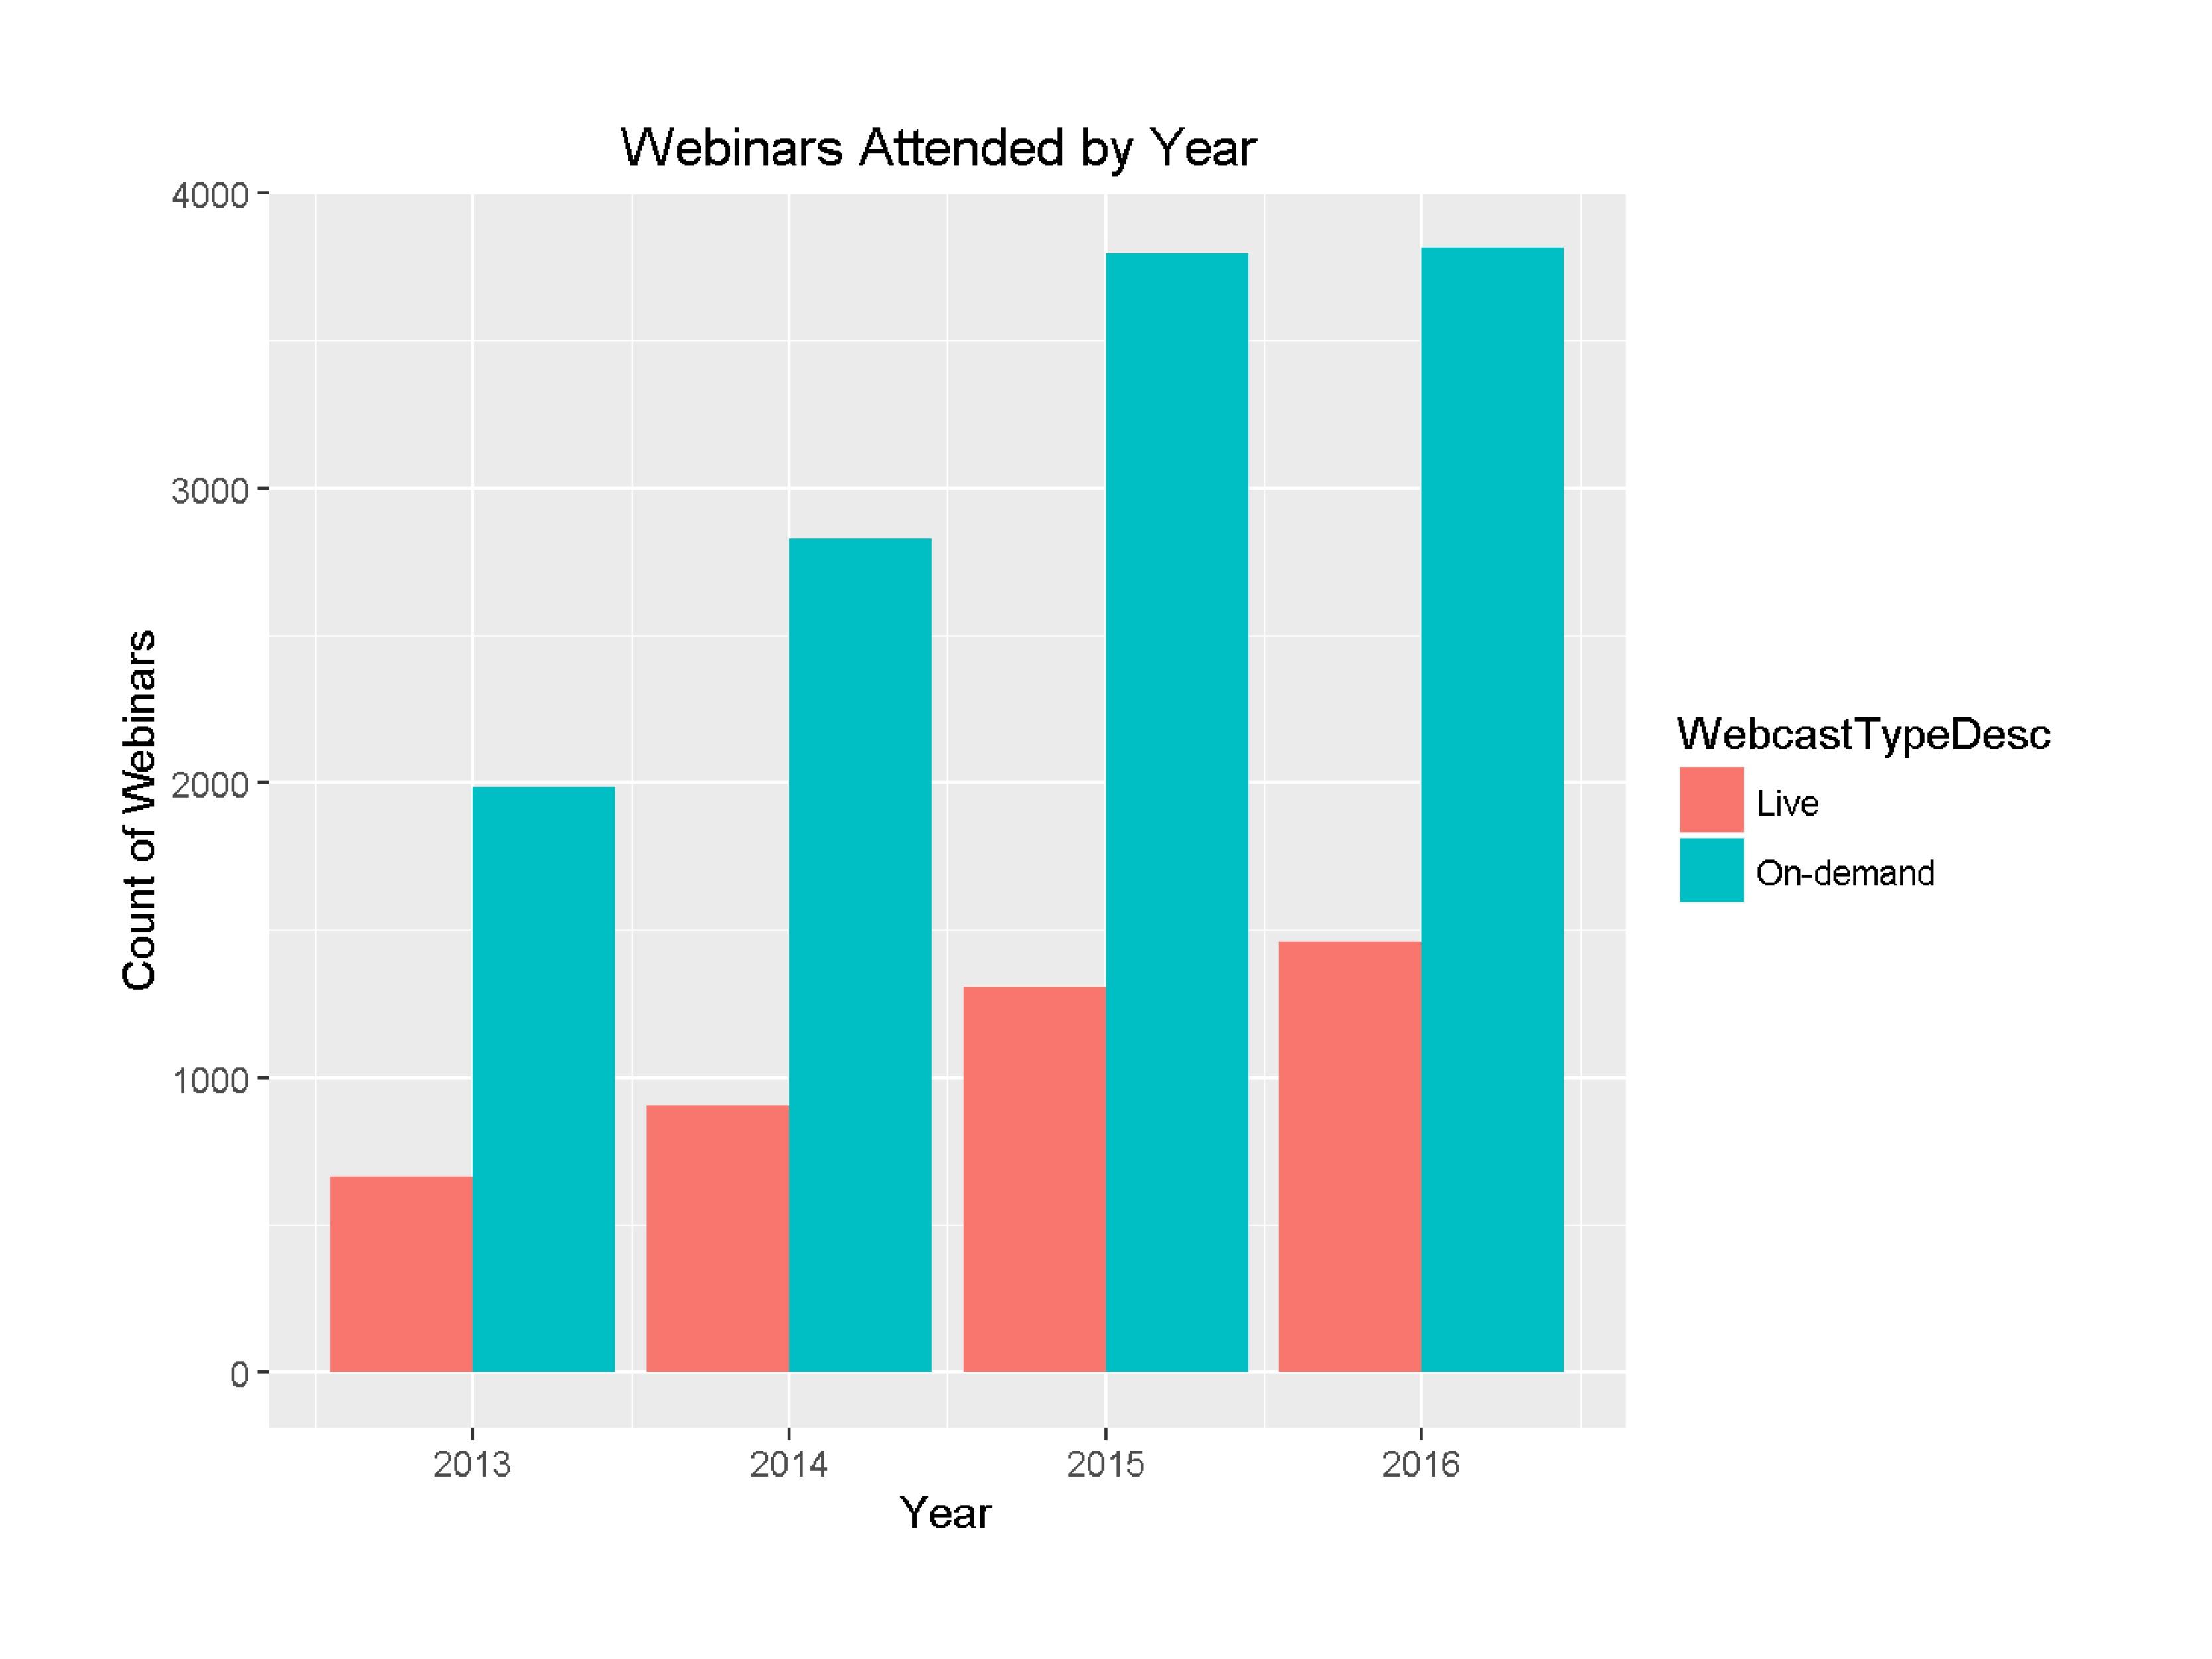 Webinars attended year on year